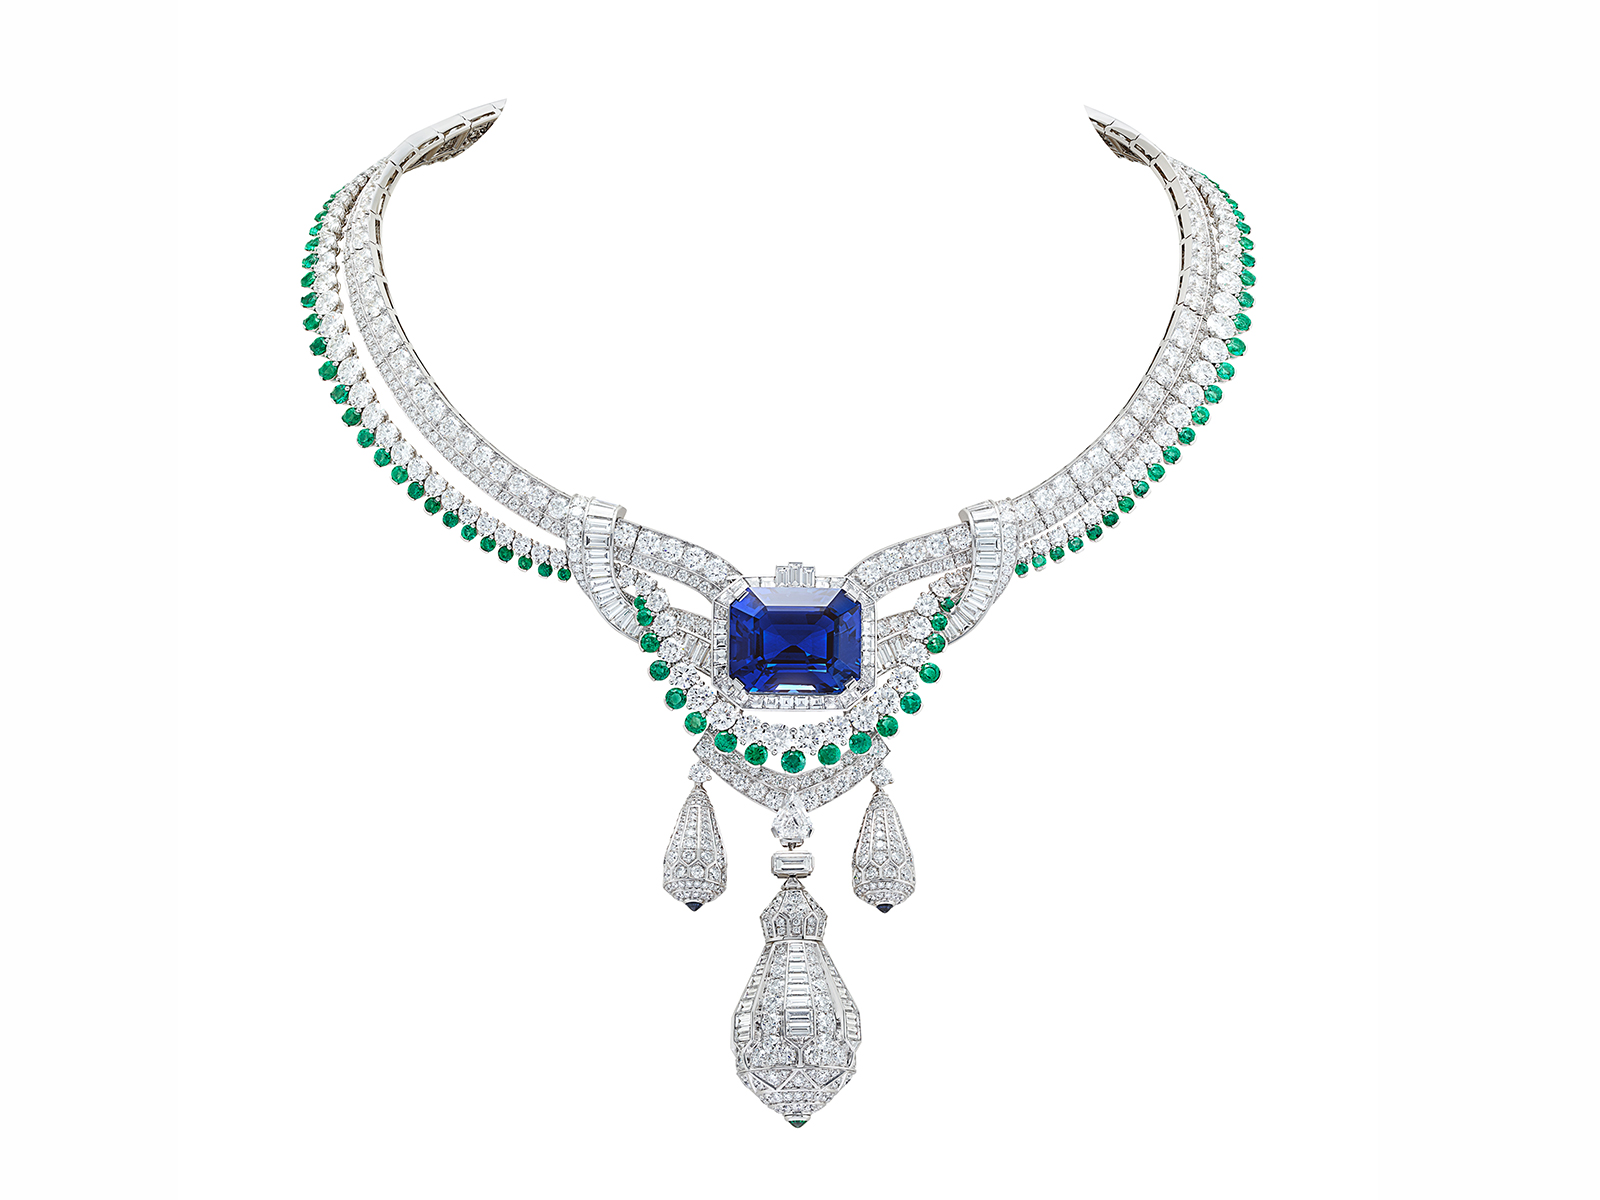 Van Cleef Amp Arpels Reveals Its New High Jewellery